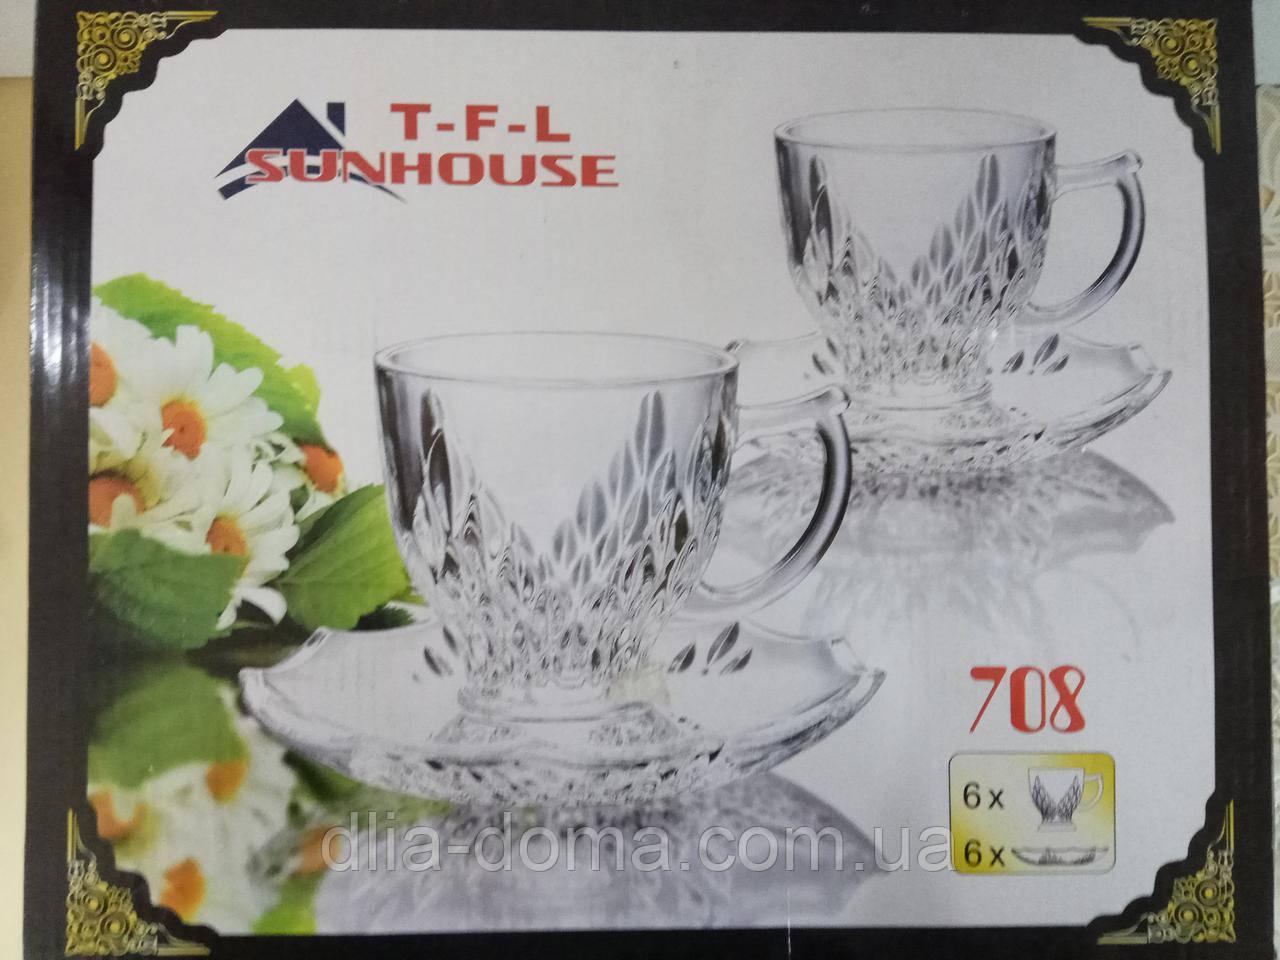 Чашки + блюдца ,6+6 стекло